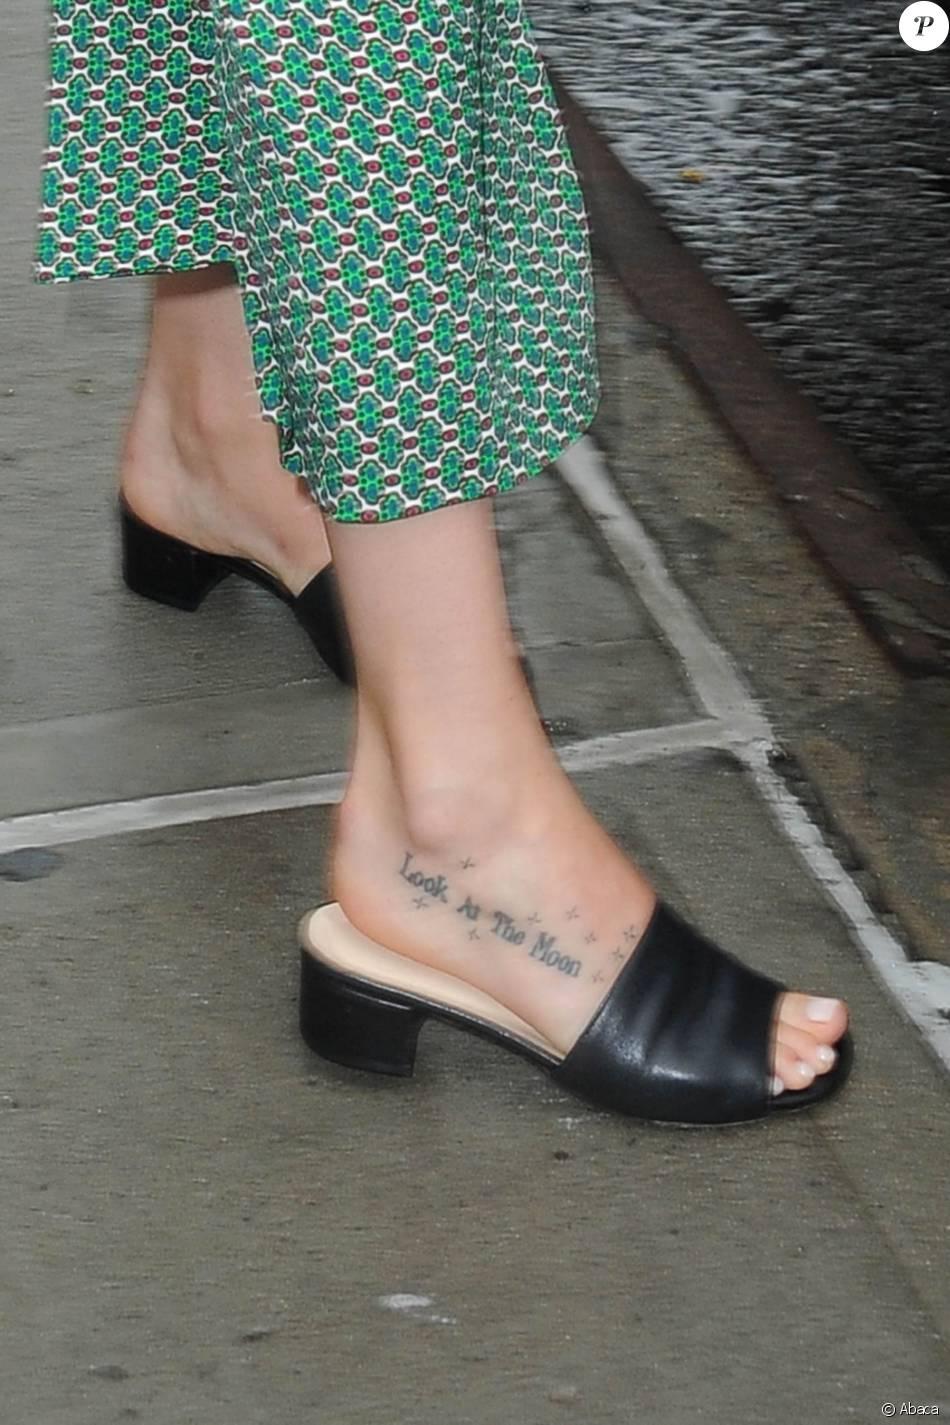 Dakota Johnson Tatouage Sur Le Pied A New York Le 10 Septembre